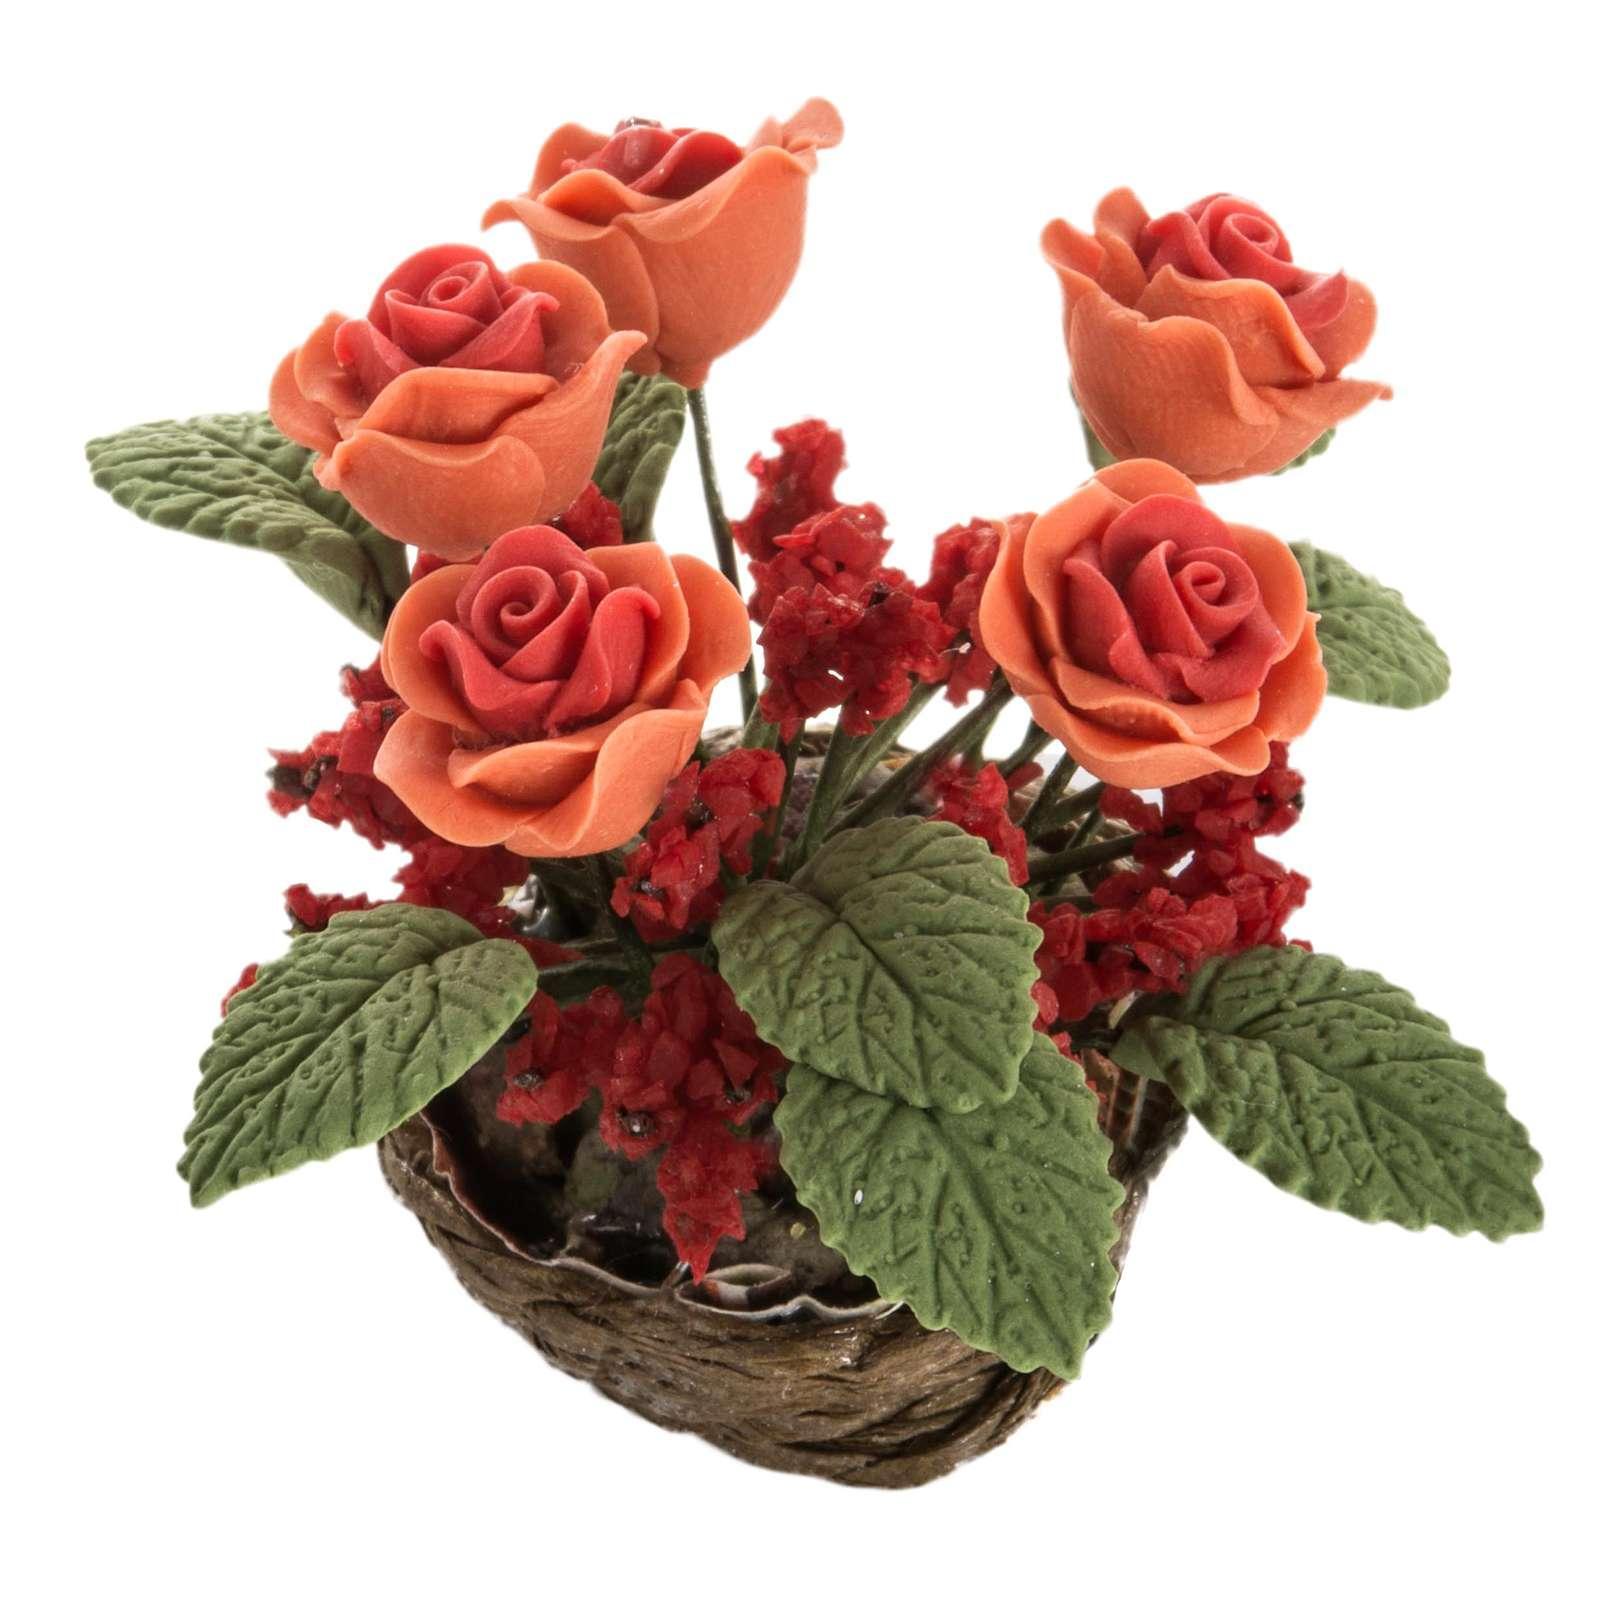 Rose miniatura presepe 4